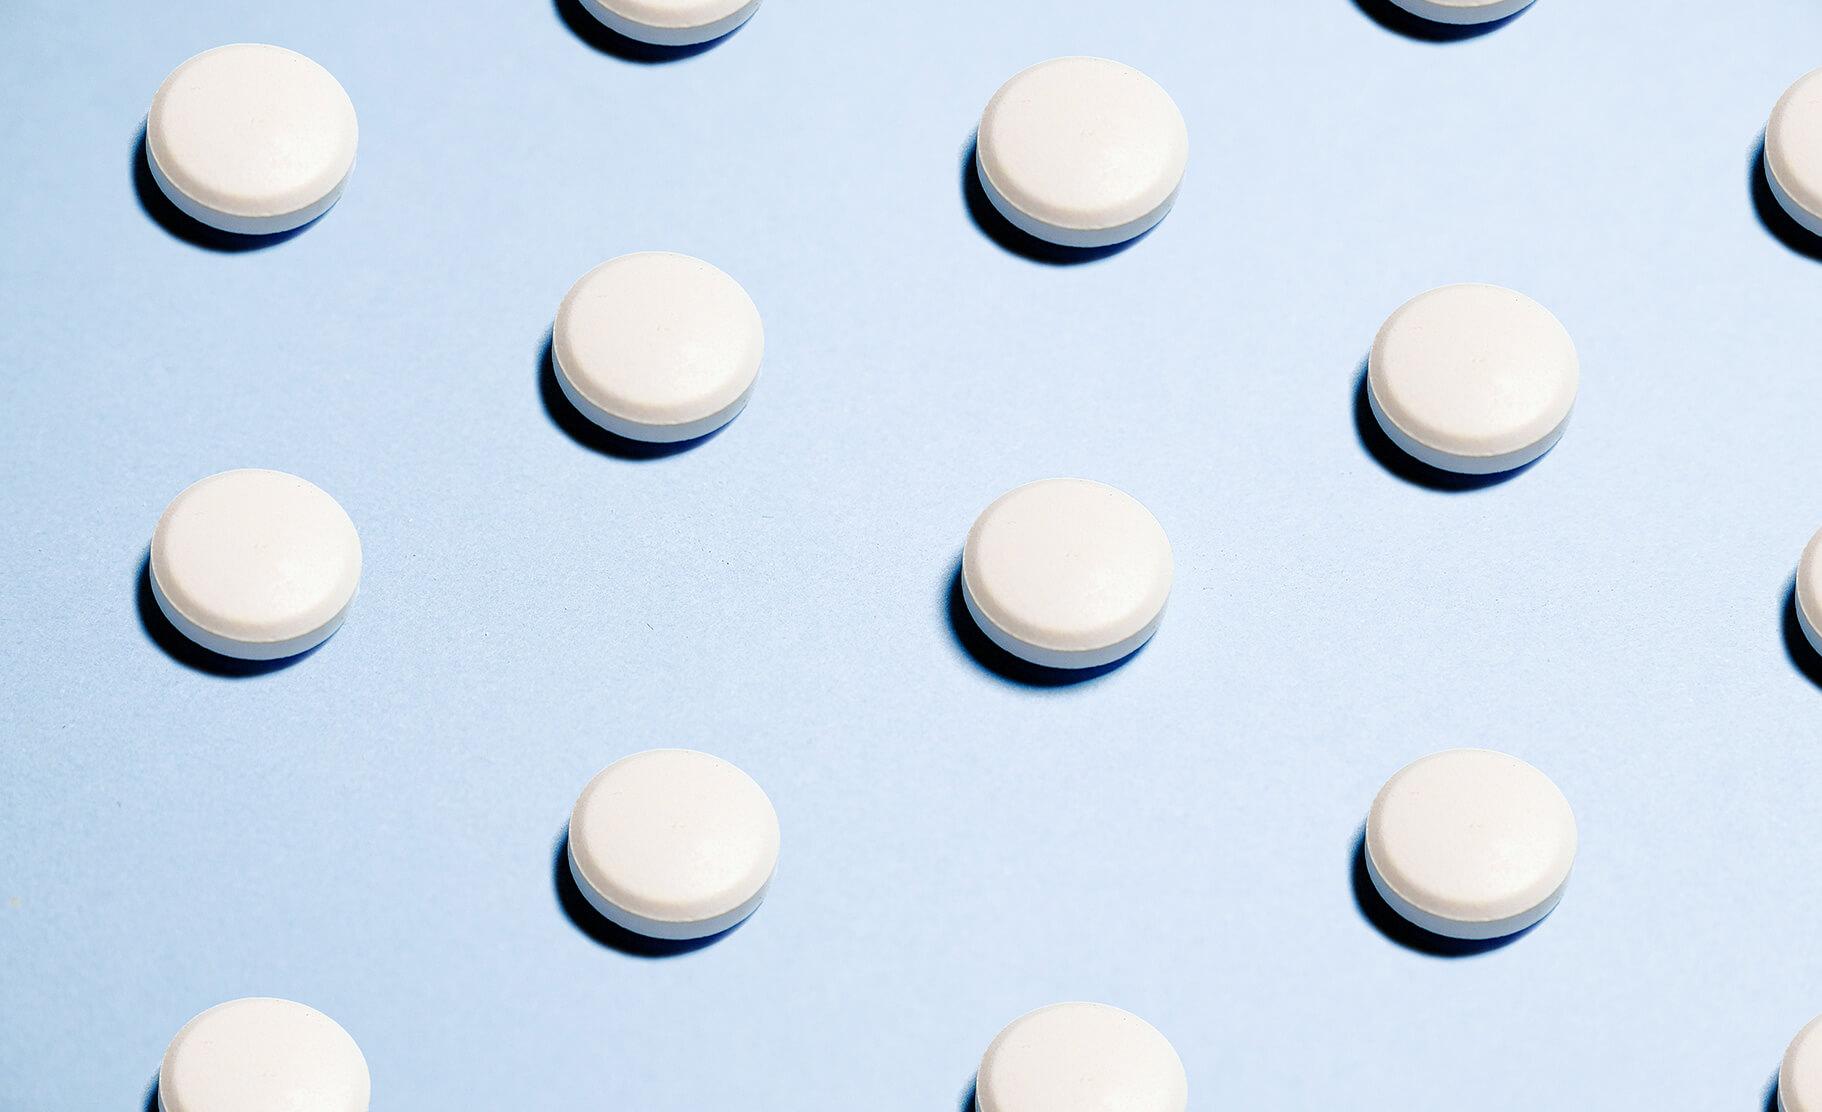 white ketamine-like tablet pills on a blue background